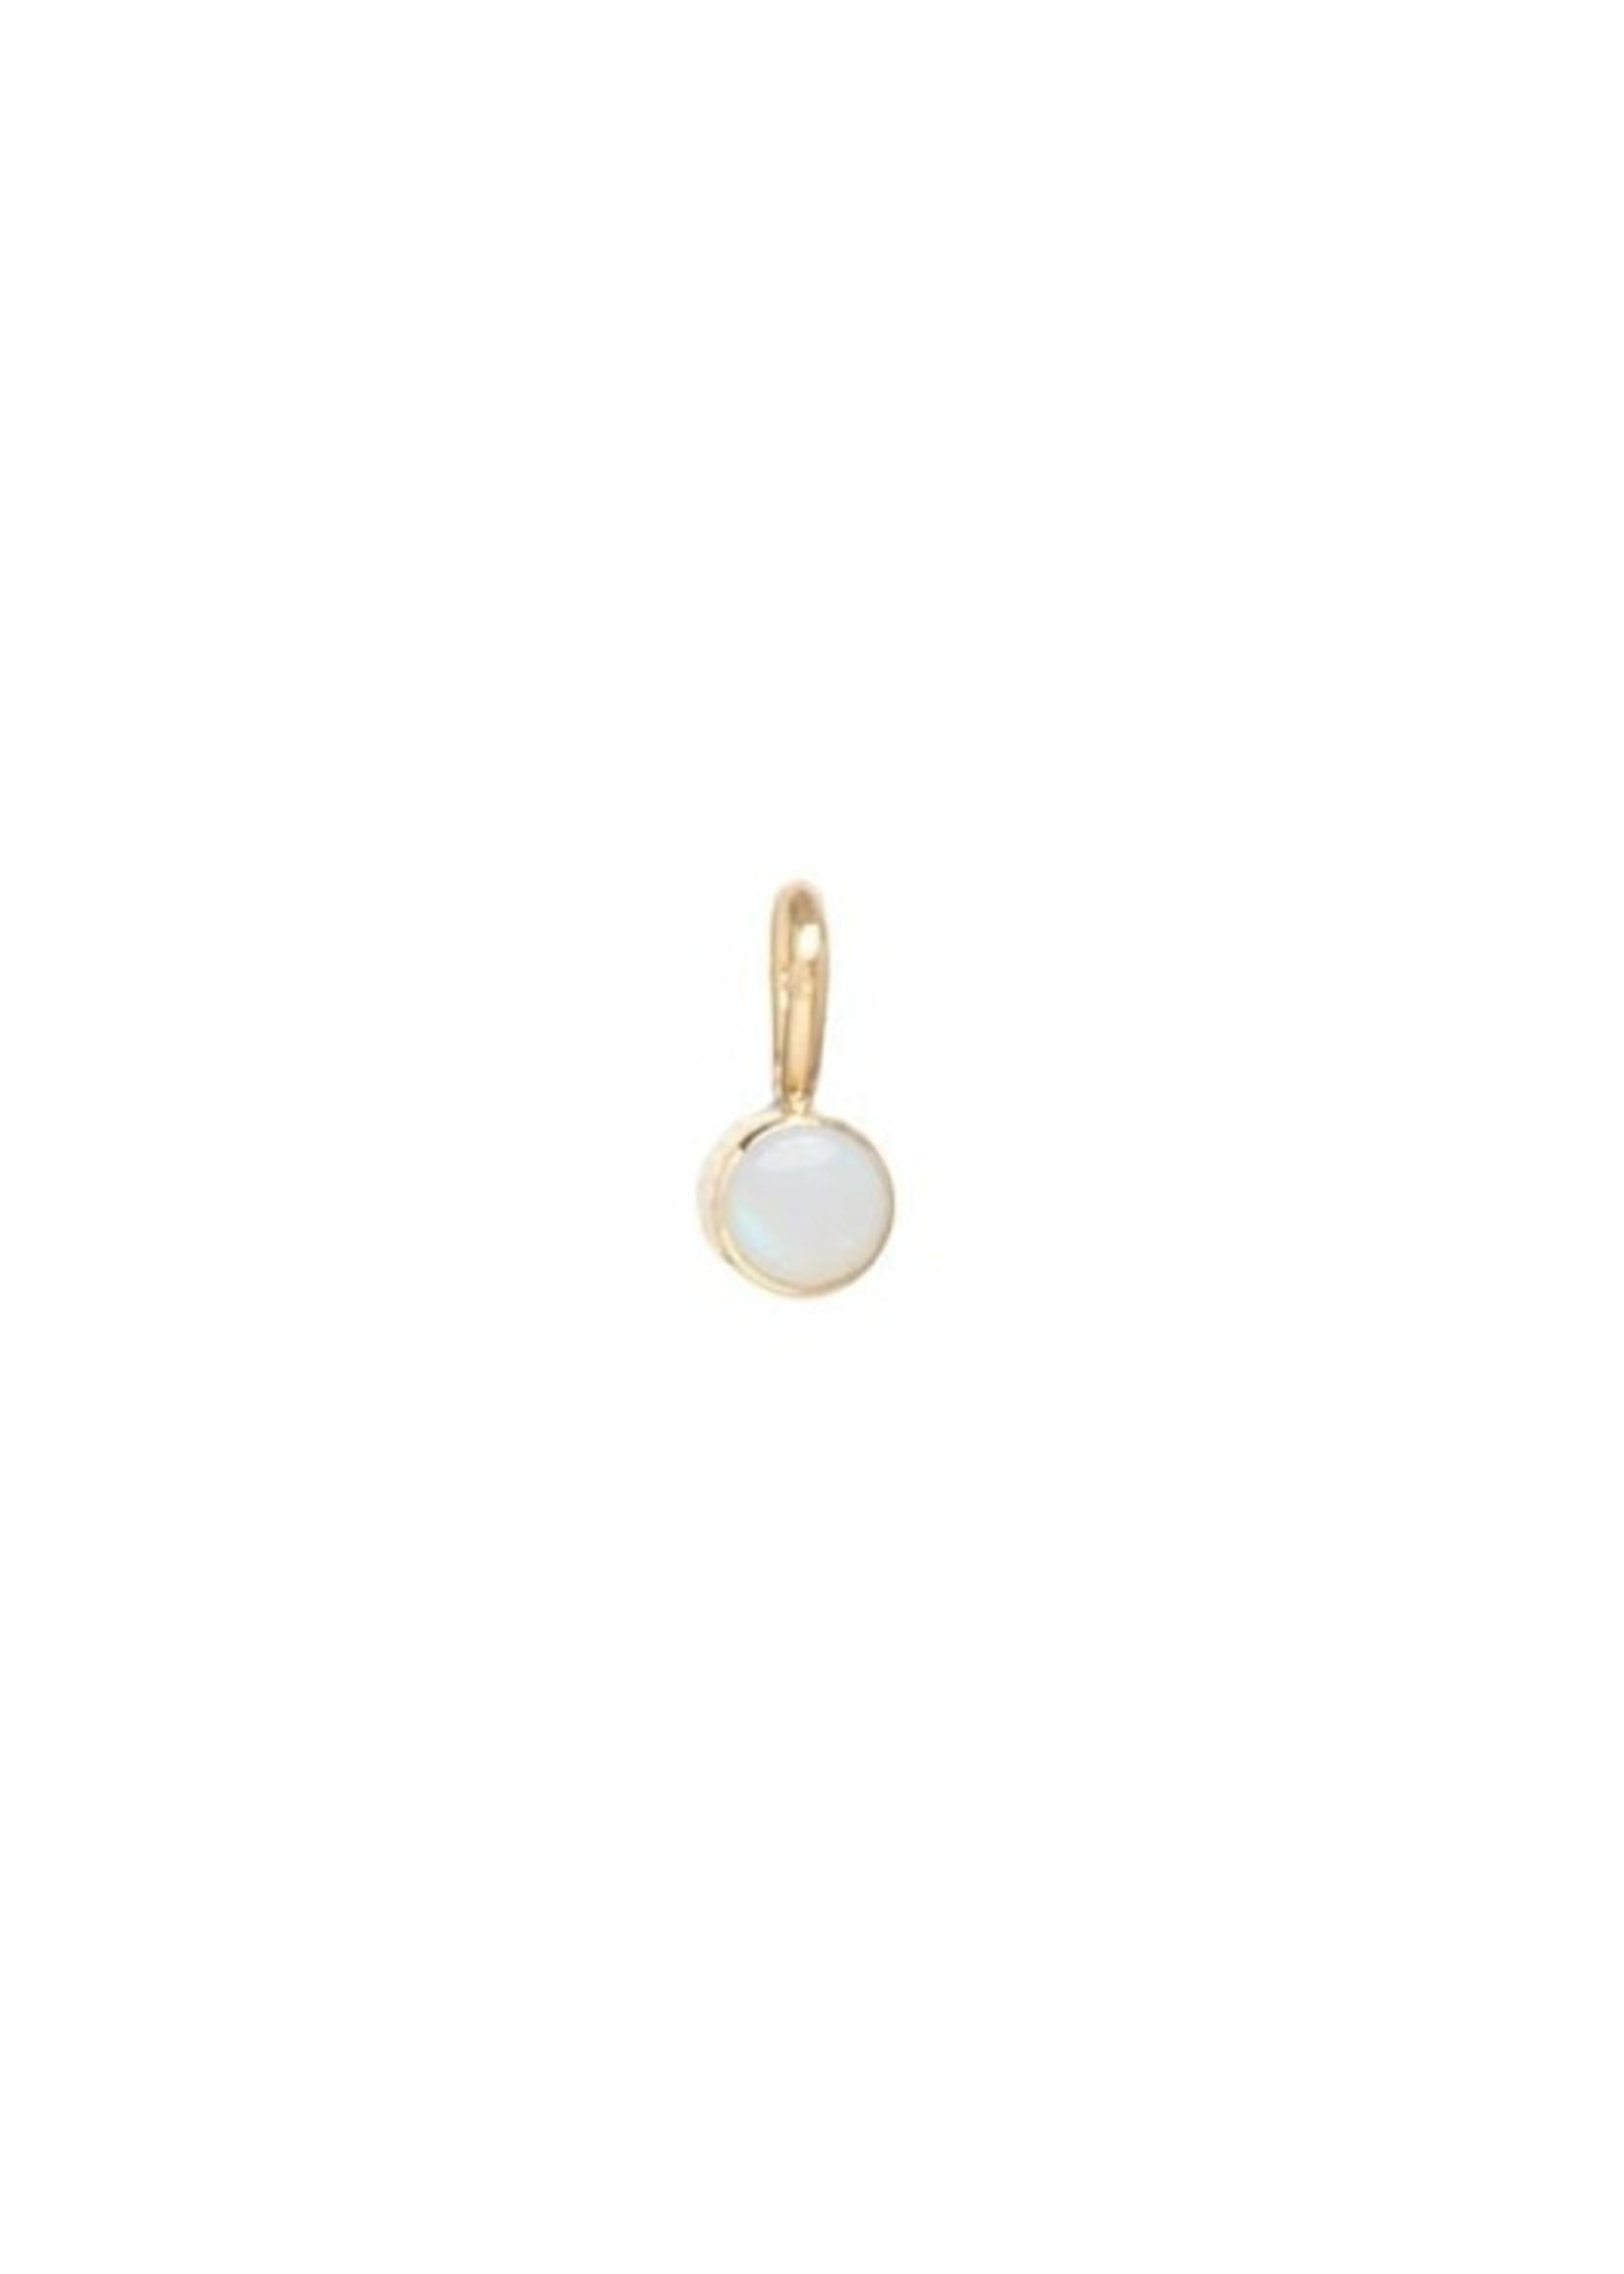 Zoe Chicco Opal Charm Pendant